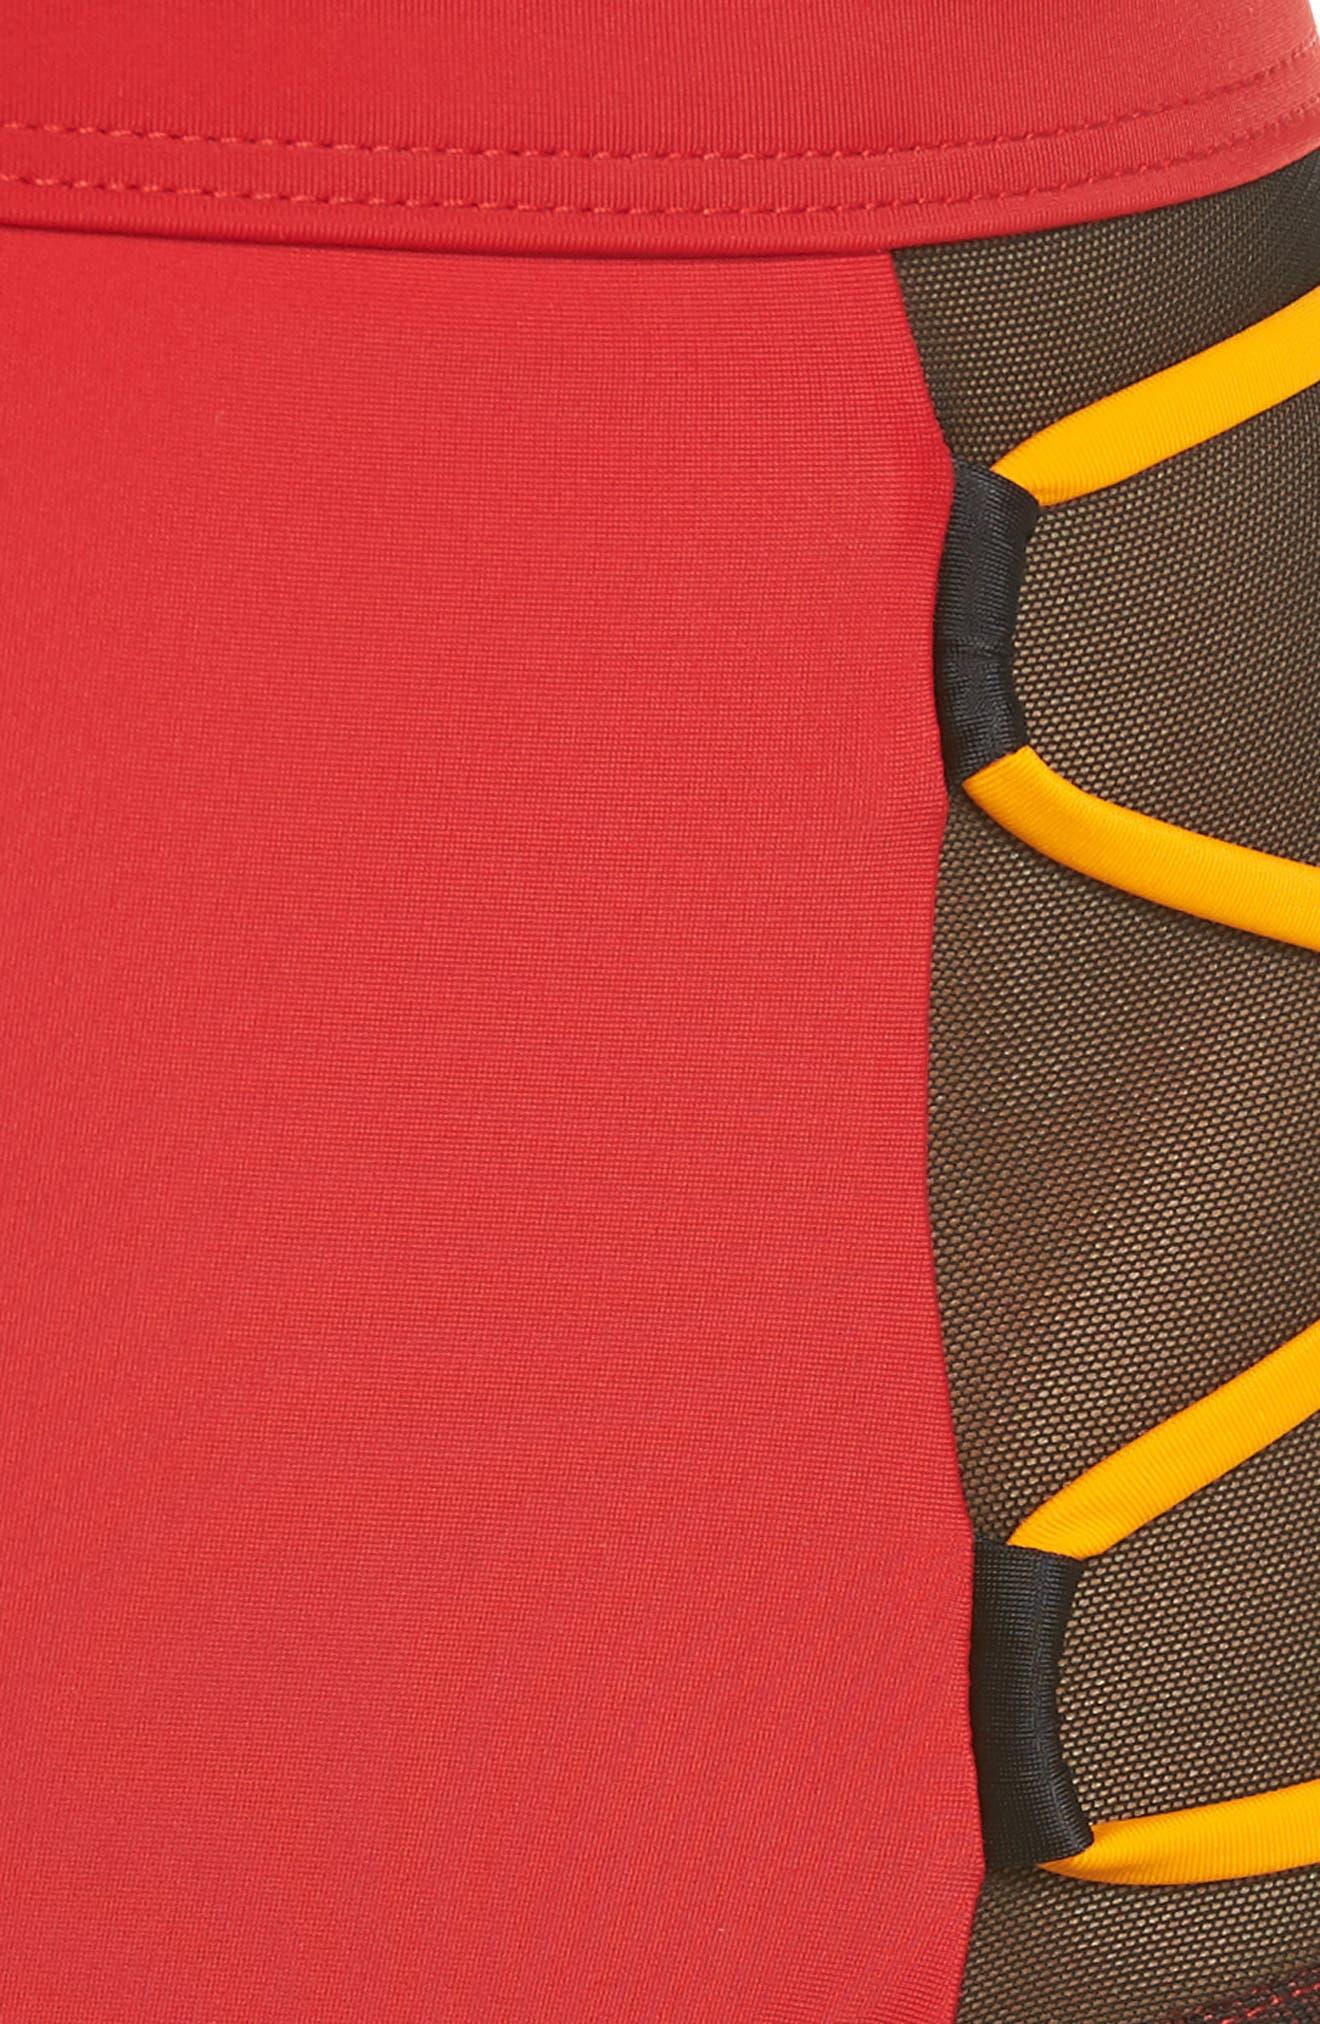 Launch Bikini Bottoms,                             Alternate thumbnail 5, color,                             Red/ Black/ Orange